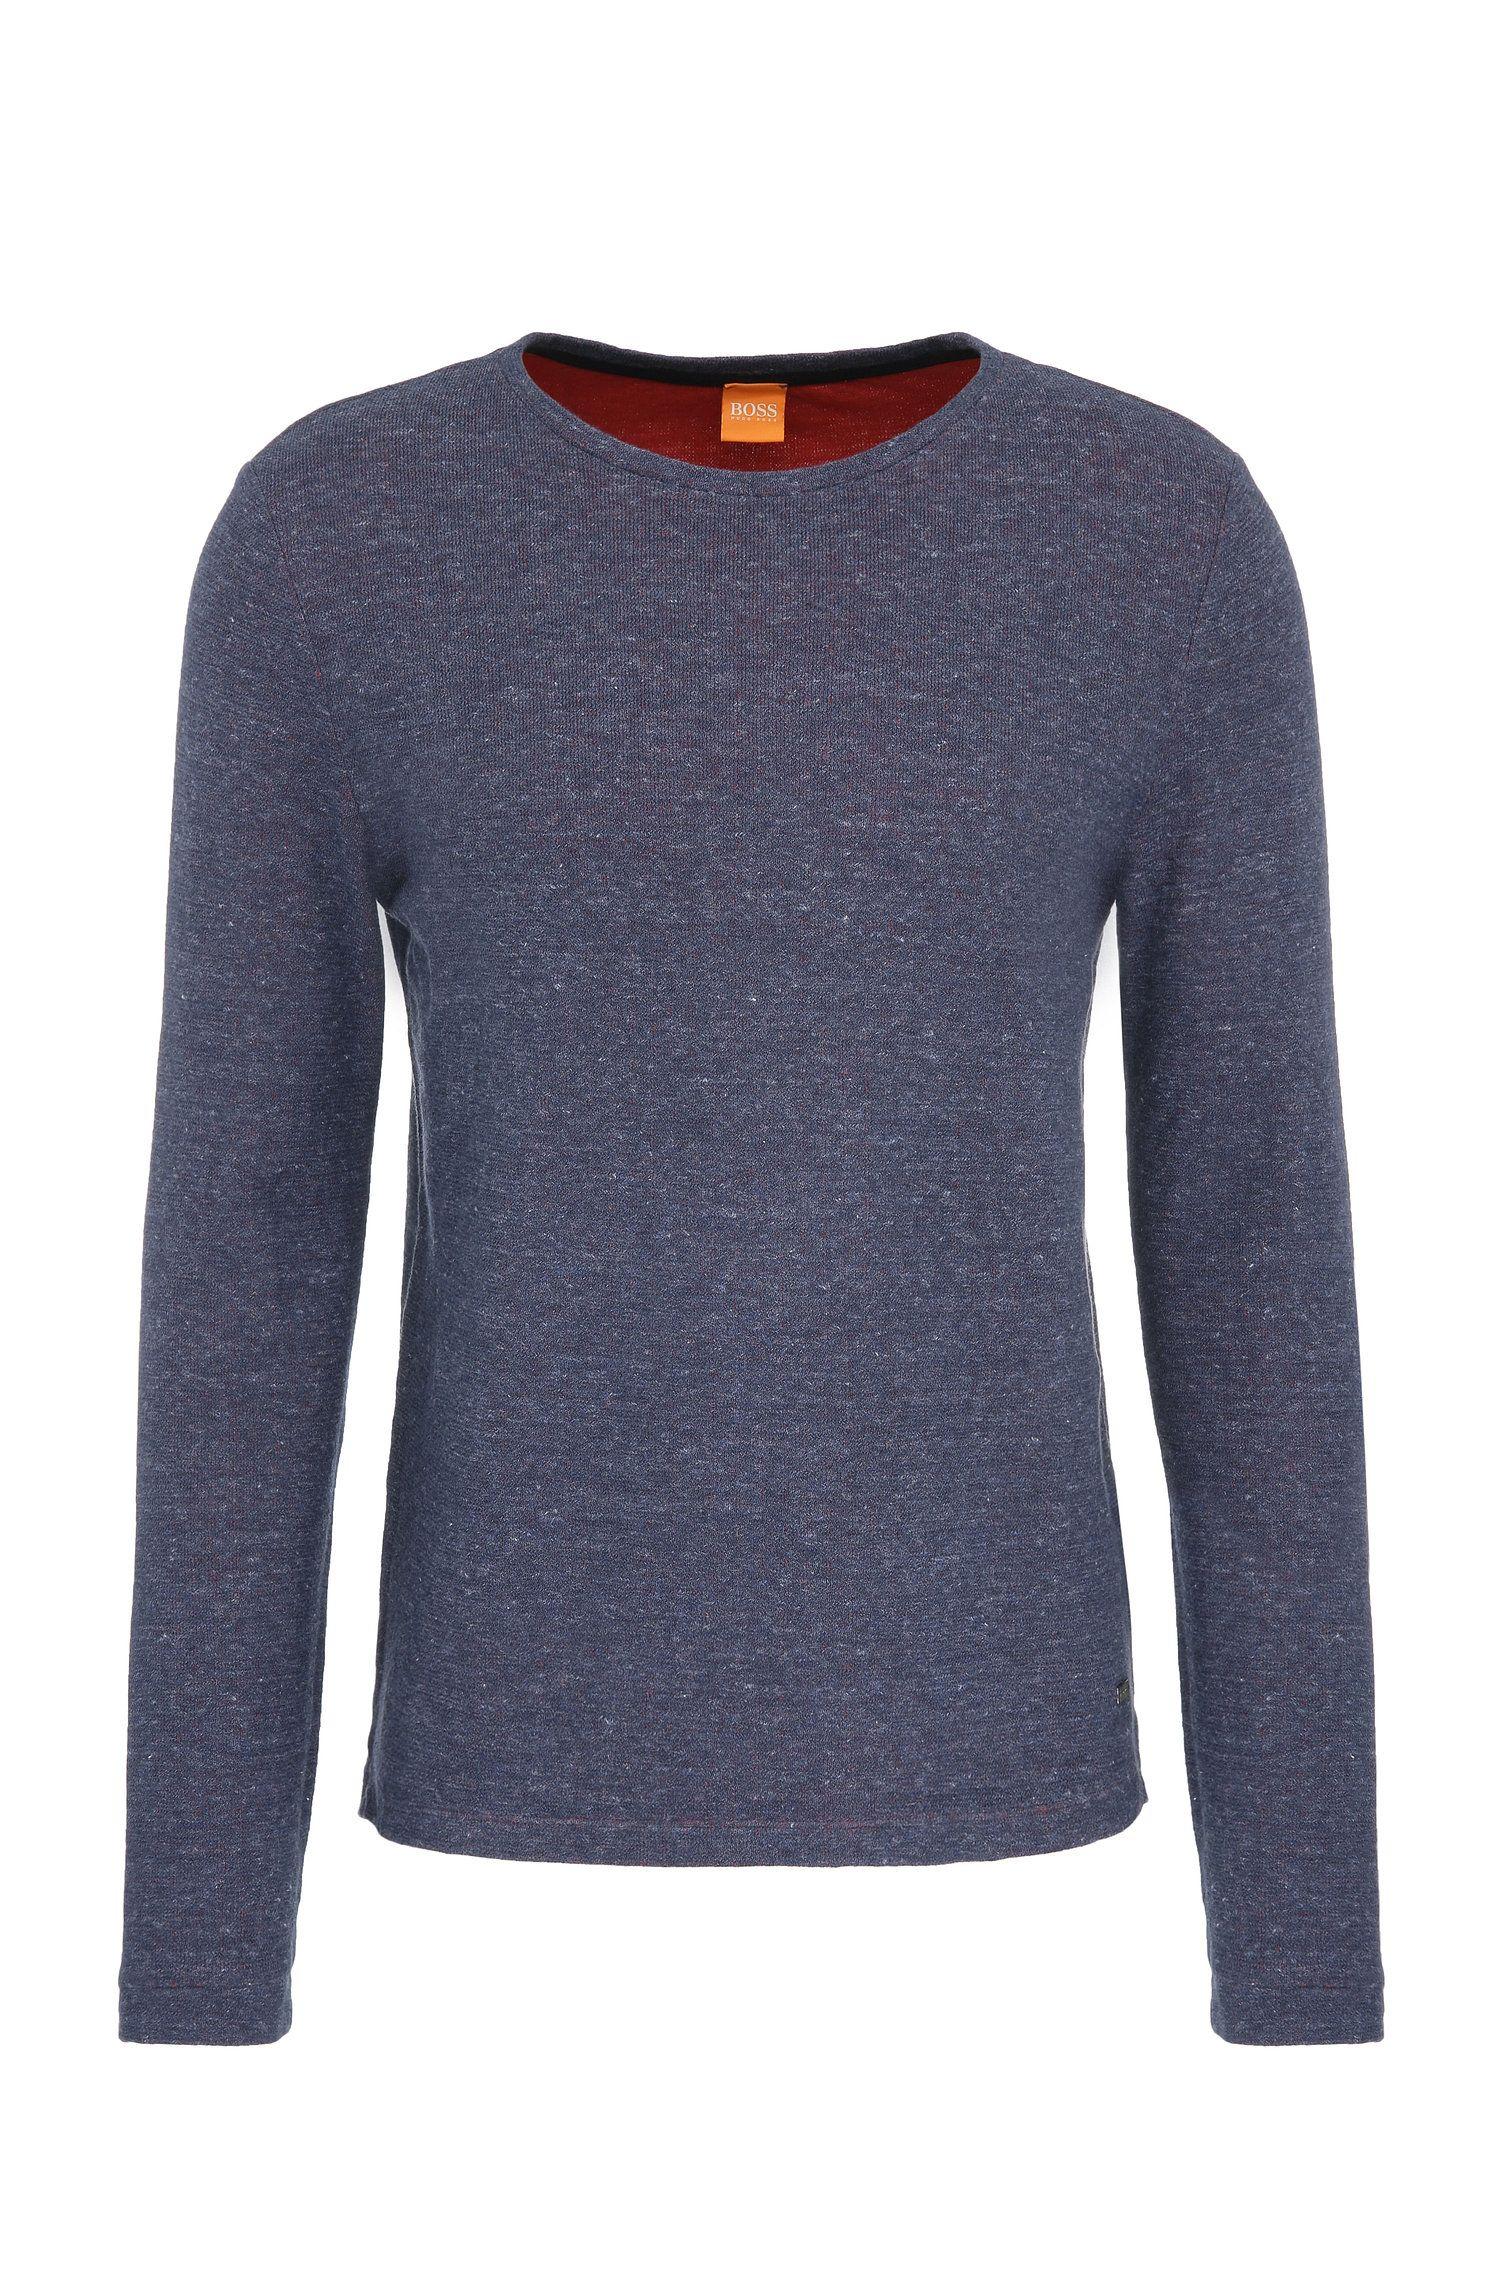 'Wanna' | Cotton Melange Long Sleeve Shirt